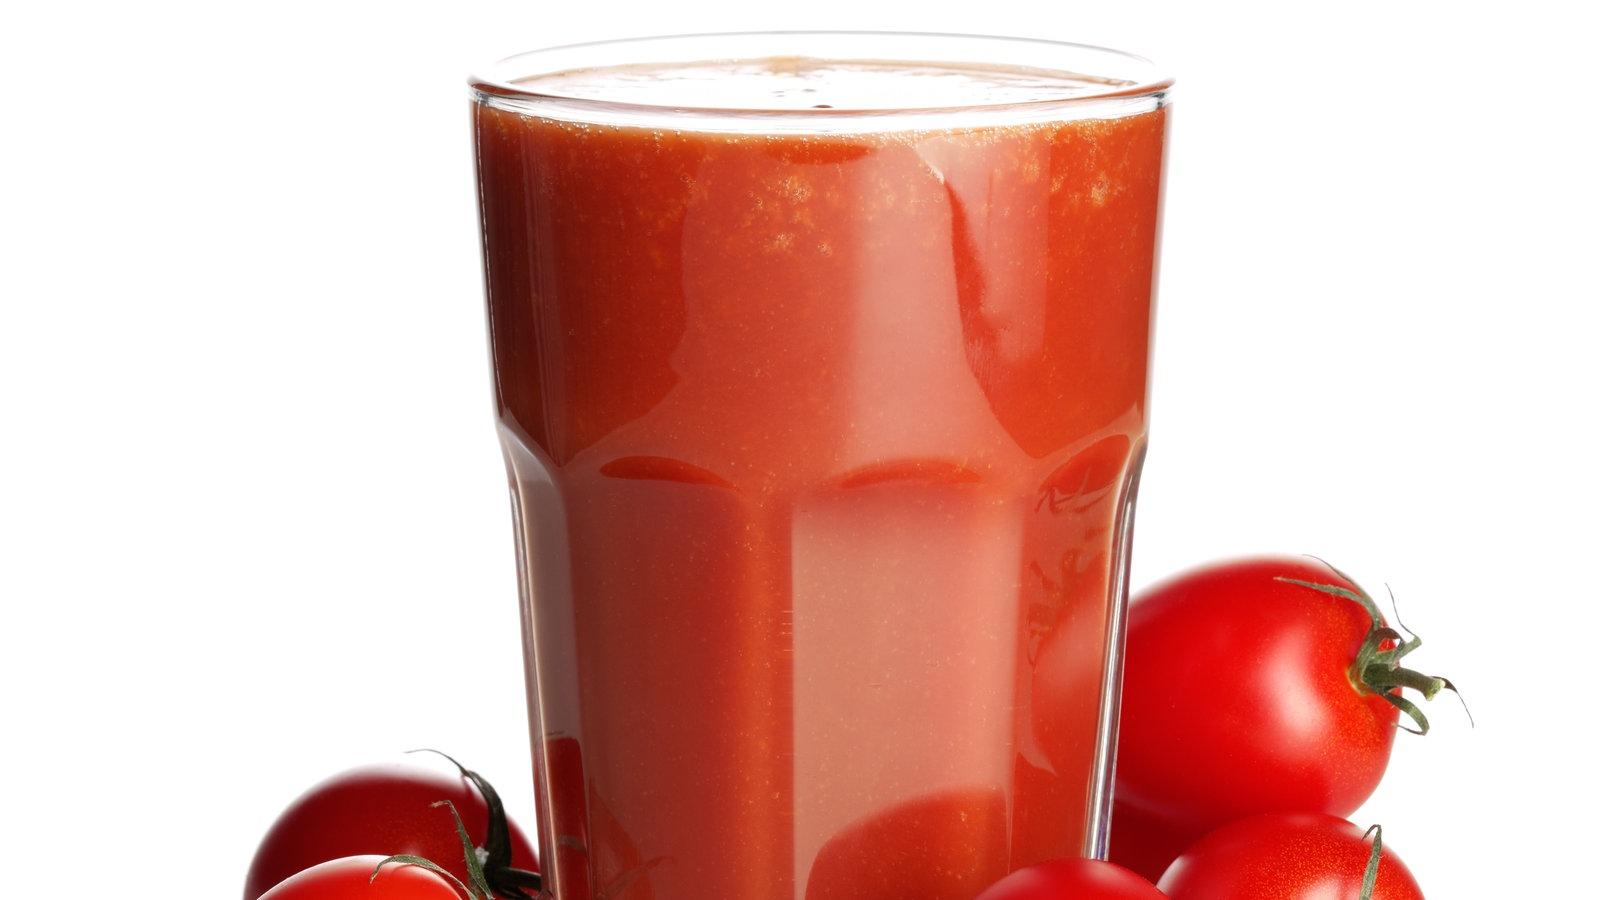 tomaten allesk nner tomate lebensmittel gesellschaft planet wissen. Black Bedroom Furniture Sets. Home Design Ideas